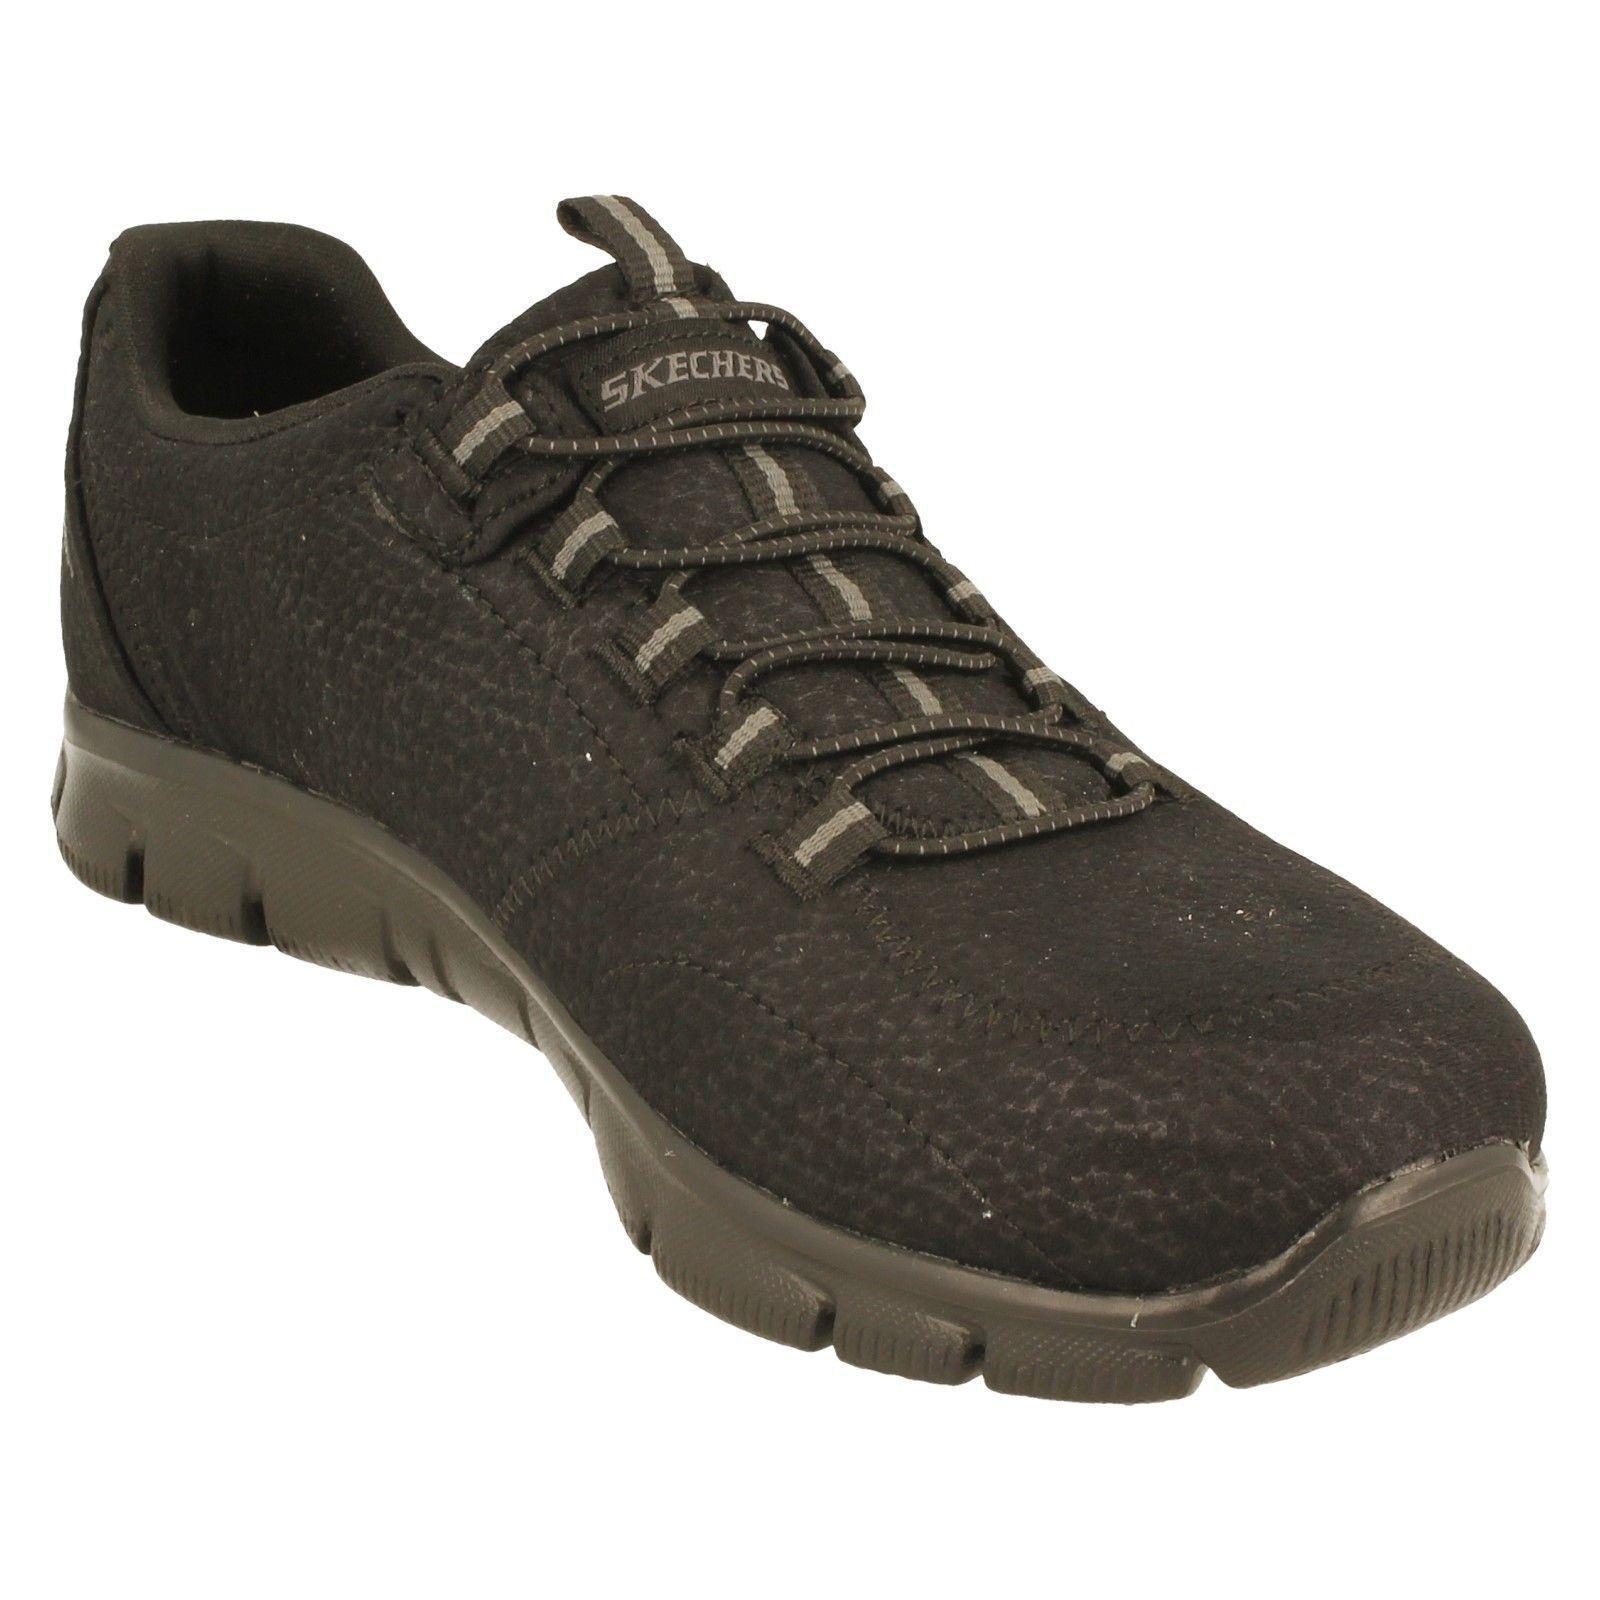 Mujer TAKE Charge Textil Elástico Zapatillas Con Elástico Textil Encaje de Skechers 6ec7e9